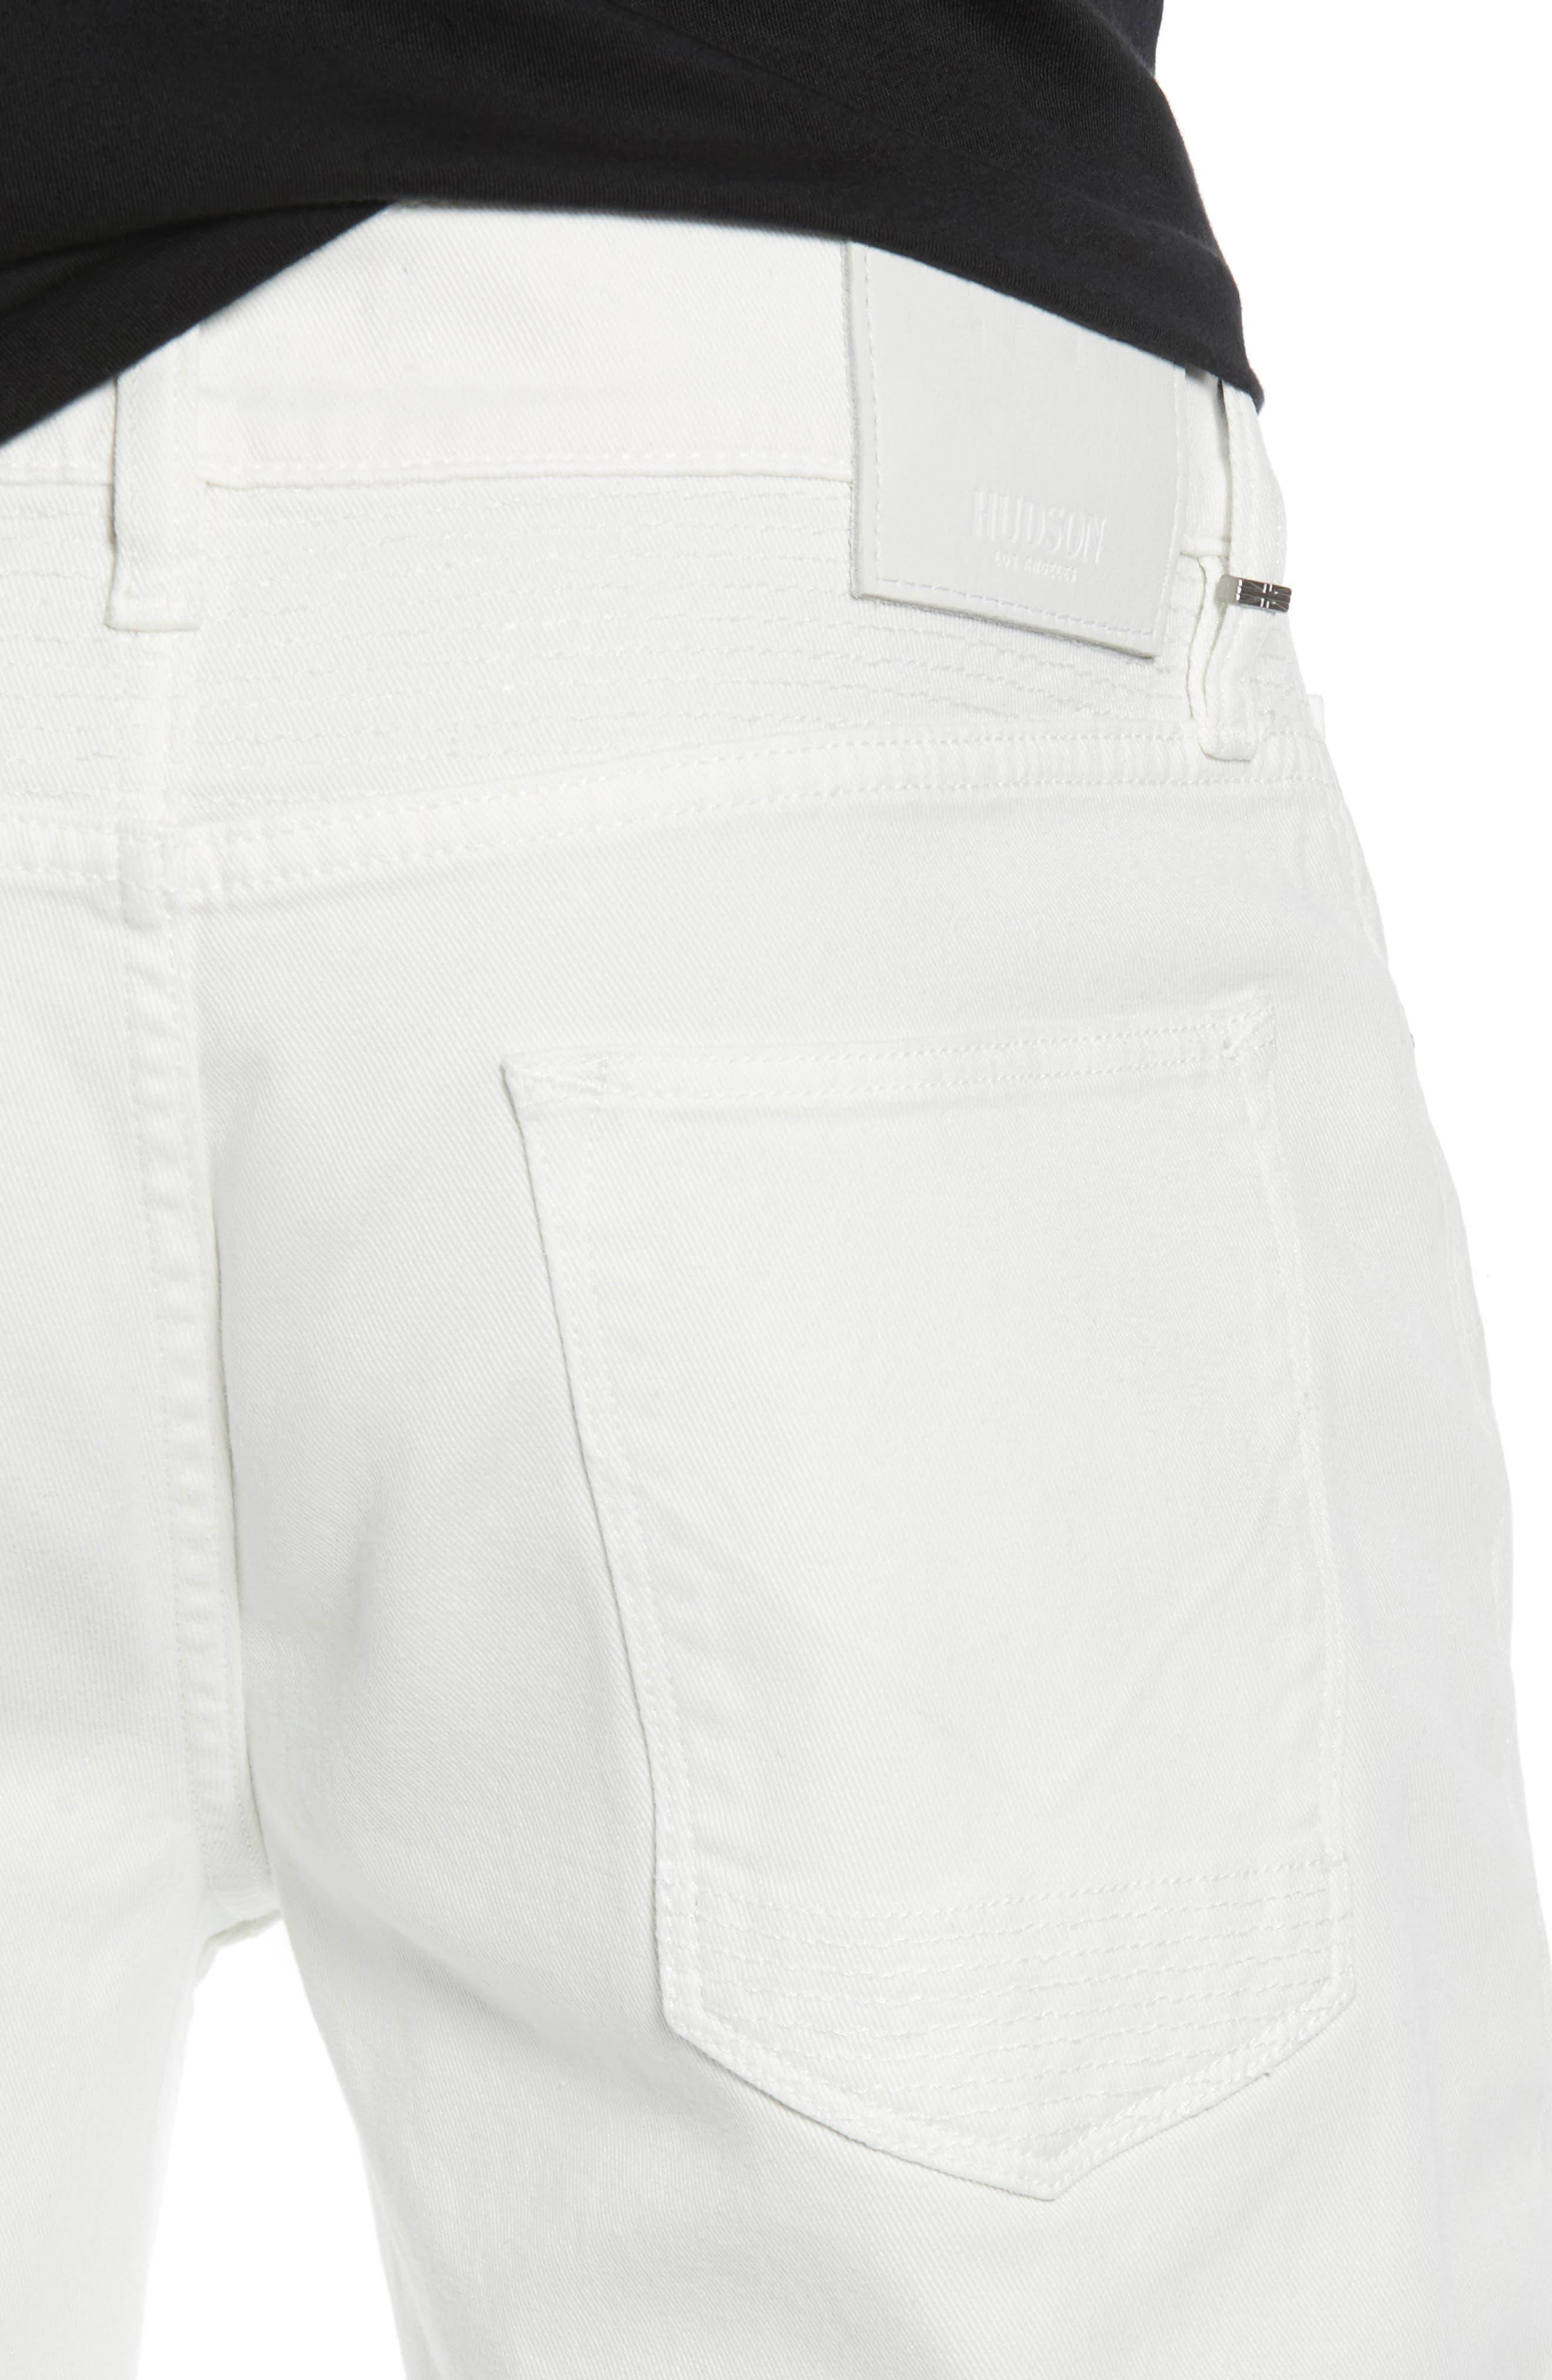 Blinder Biker Skinny Fit Jeans,                             Alternate thumbnail 4, color,                             DIRTY WHITE